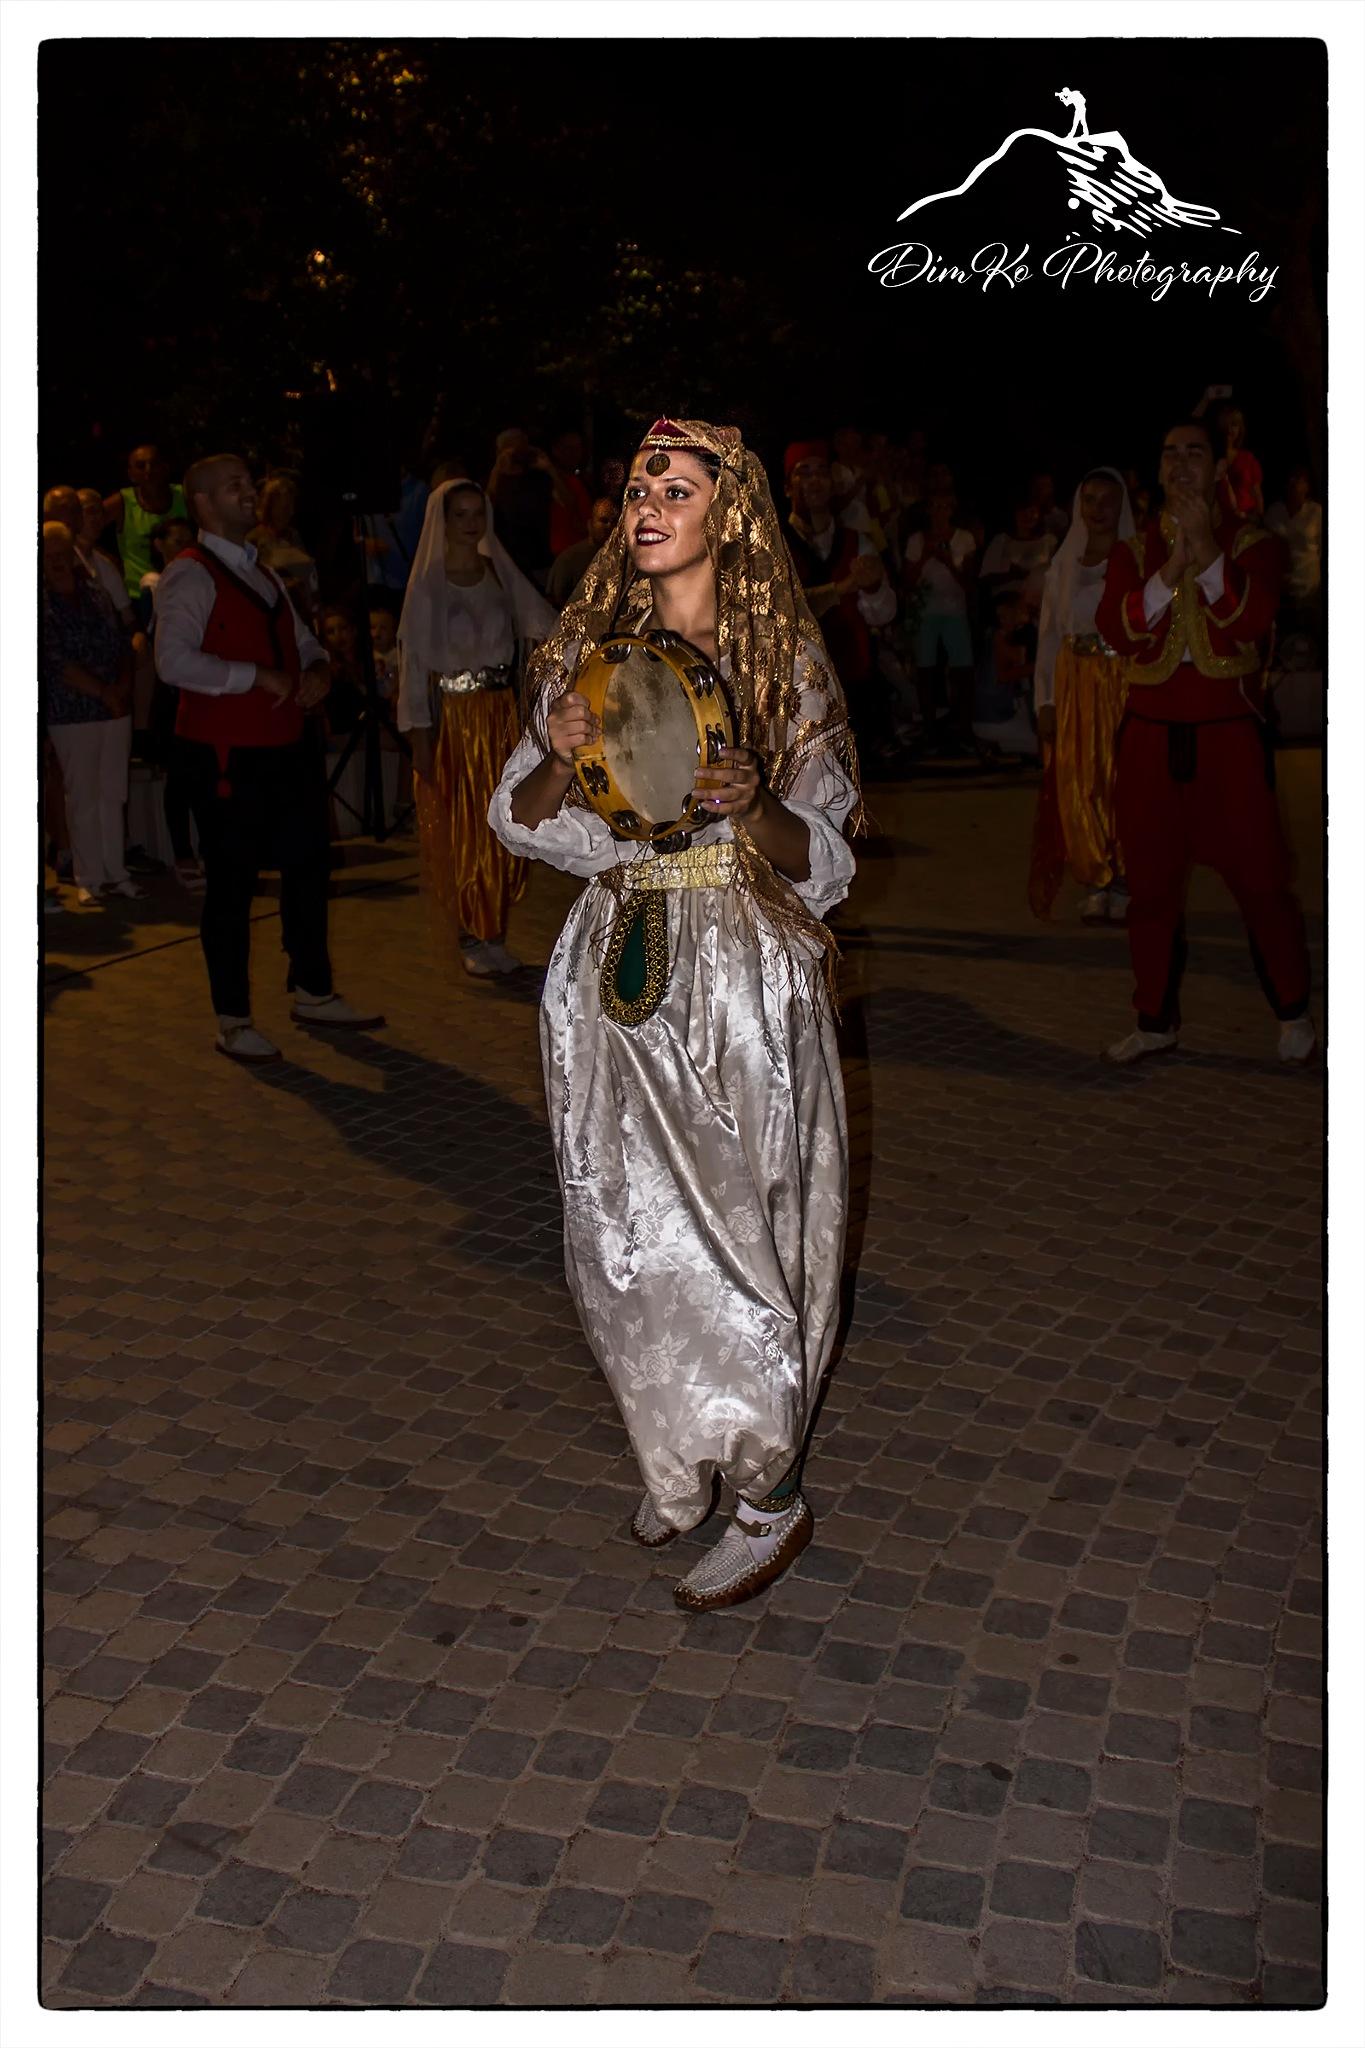 Folk dancer by dimce.korunoski